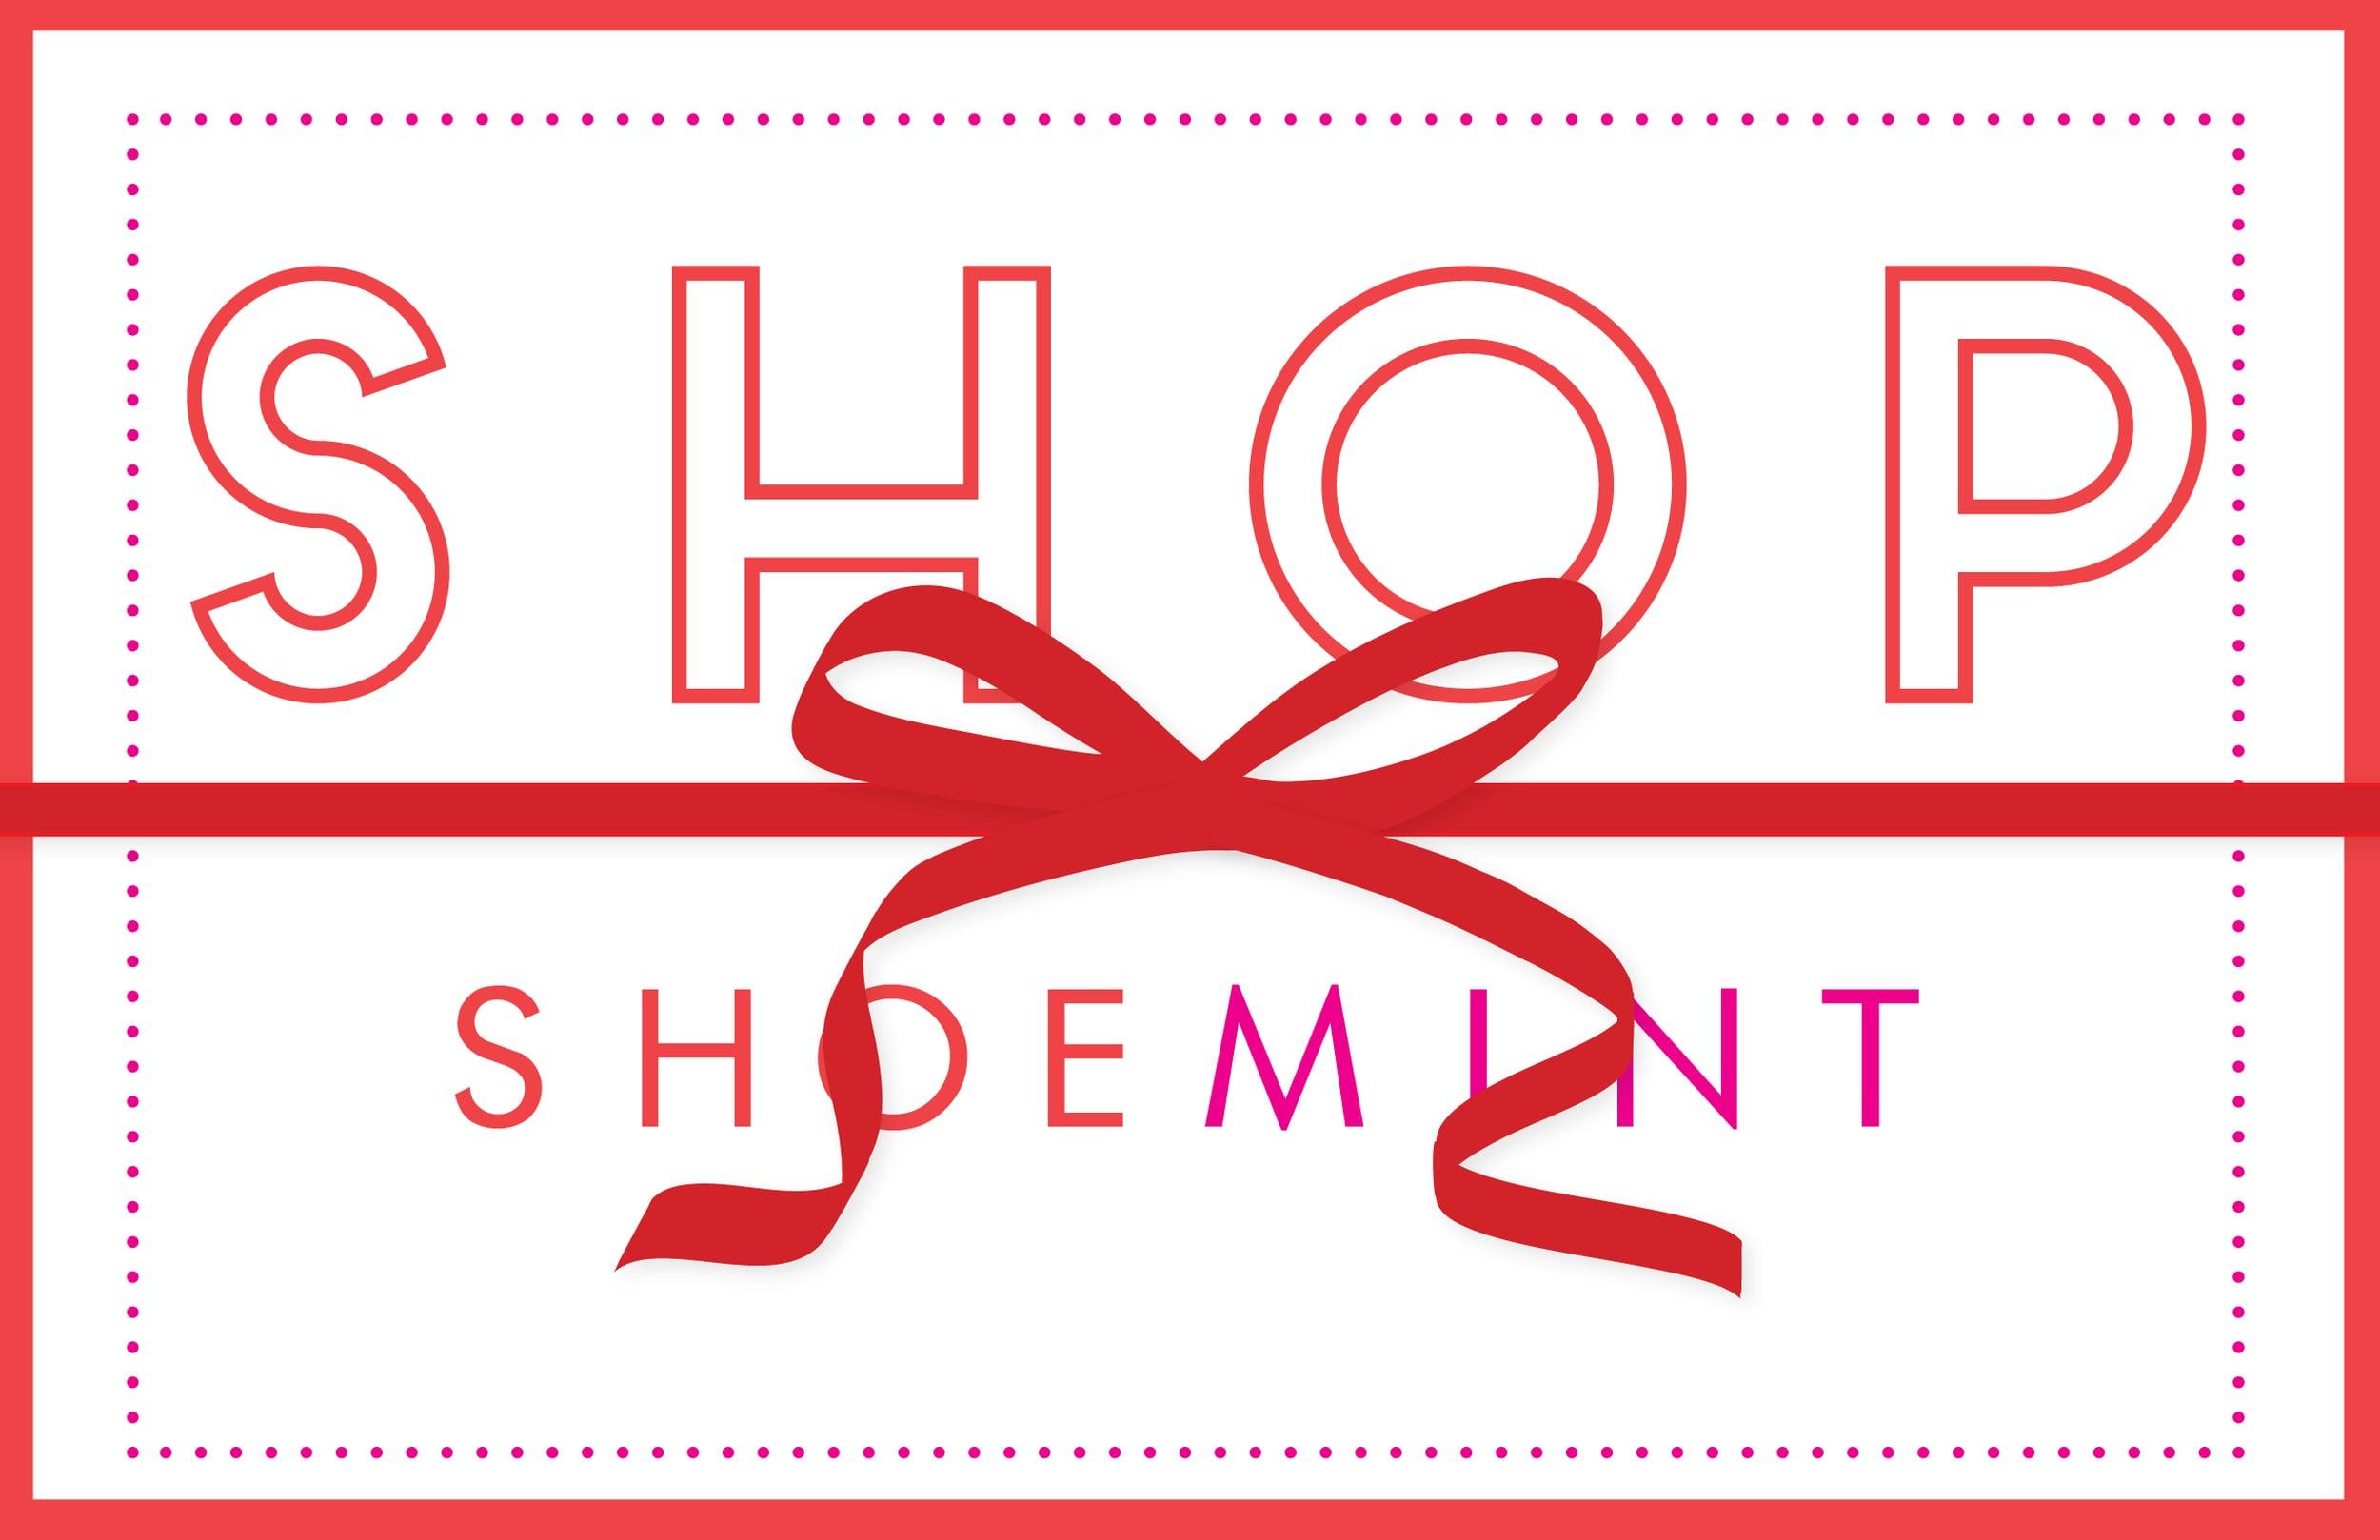 ShopShoeMint